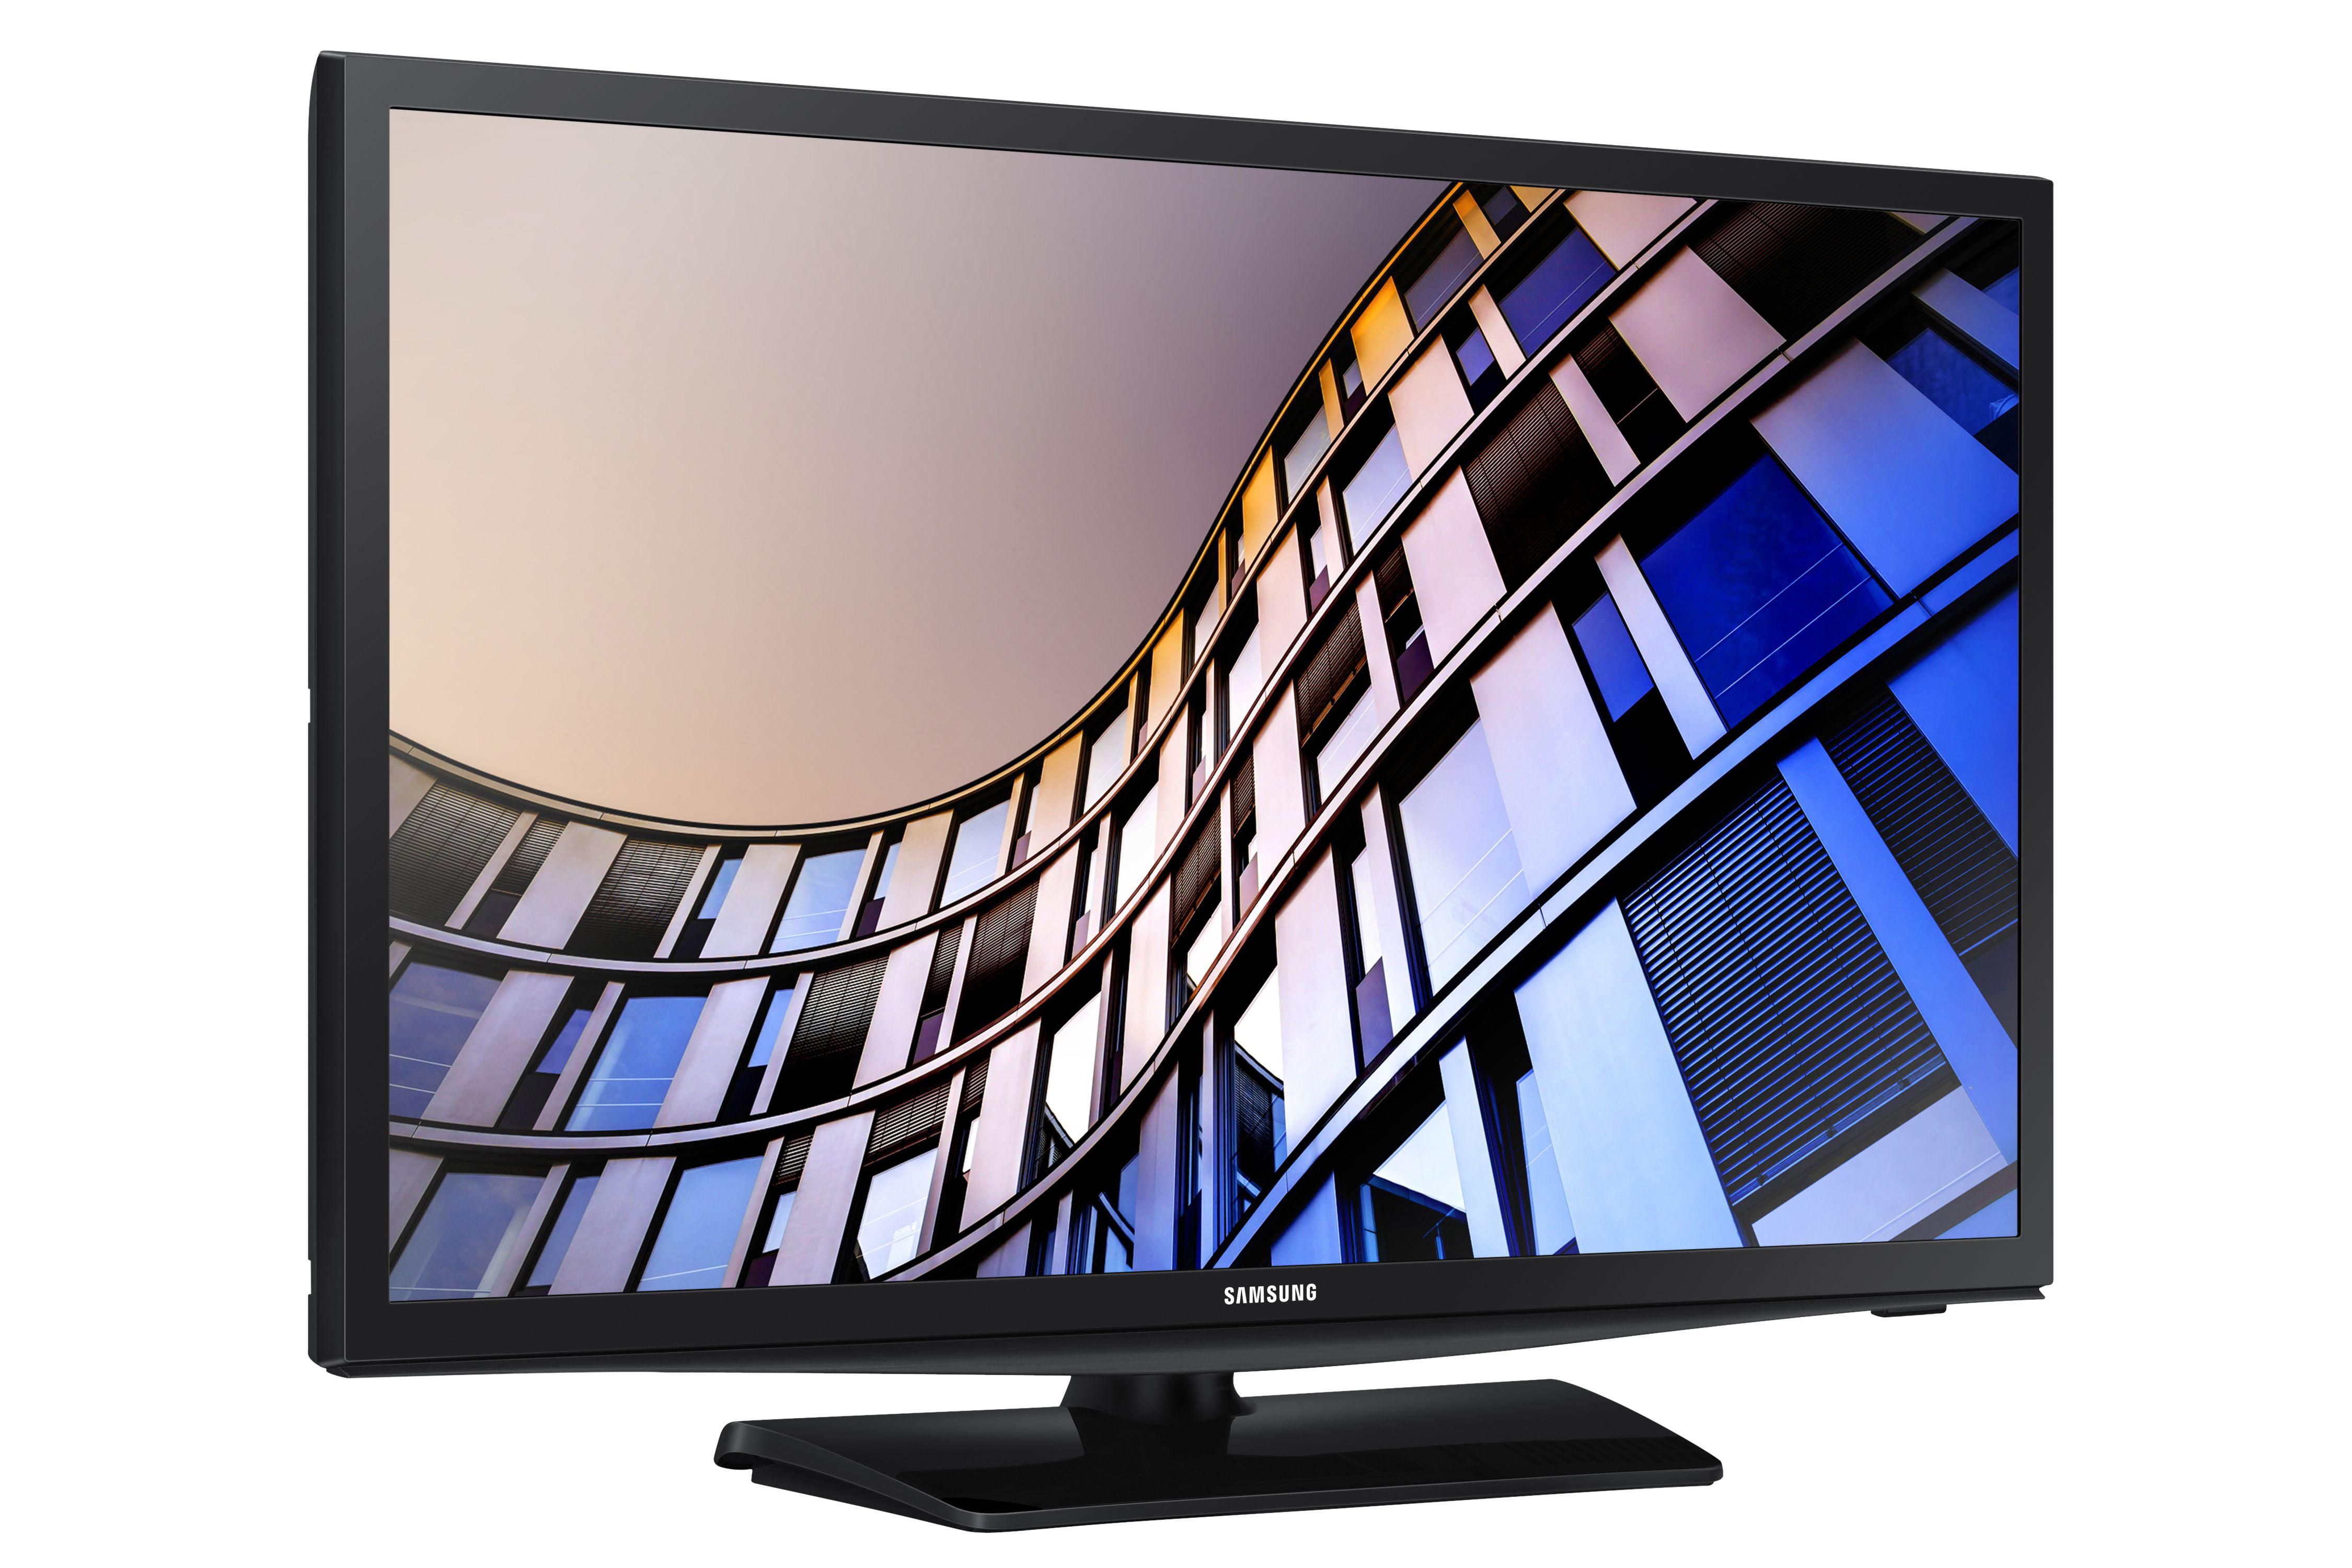 Samsung 32 Smart Tv # Magasin De Television Pas Cher